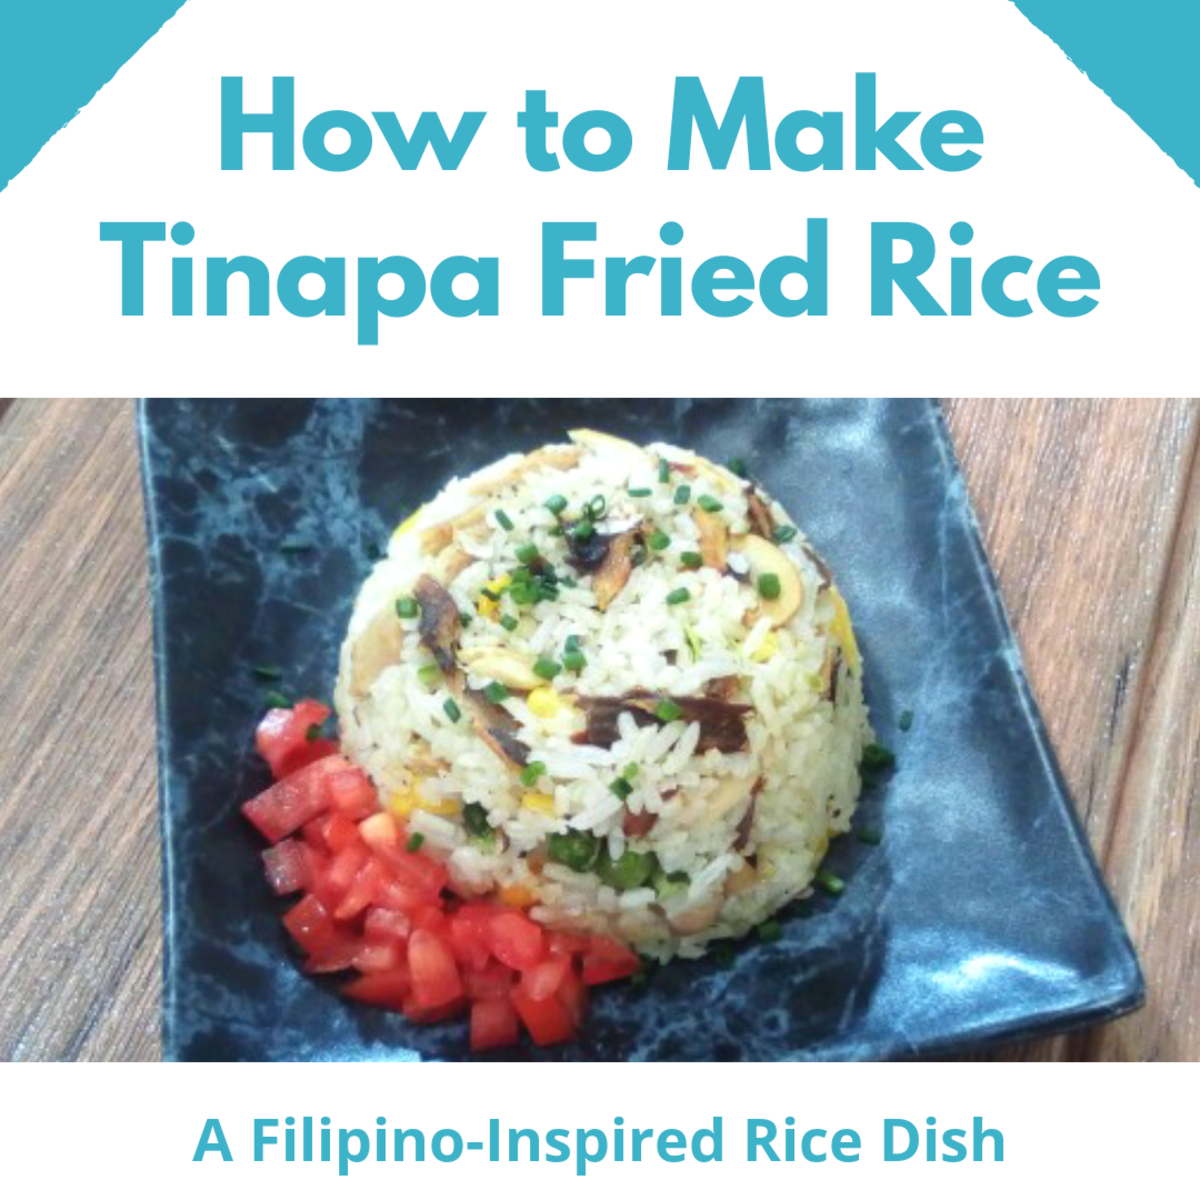 How to Make Tinapa Fried Rice: A Filipino-Inspired Dish